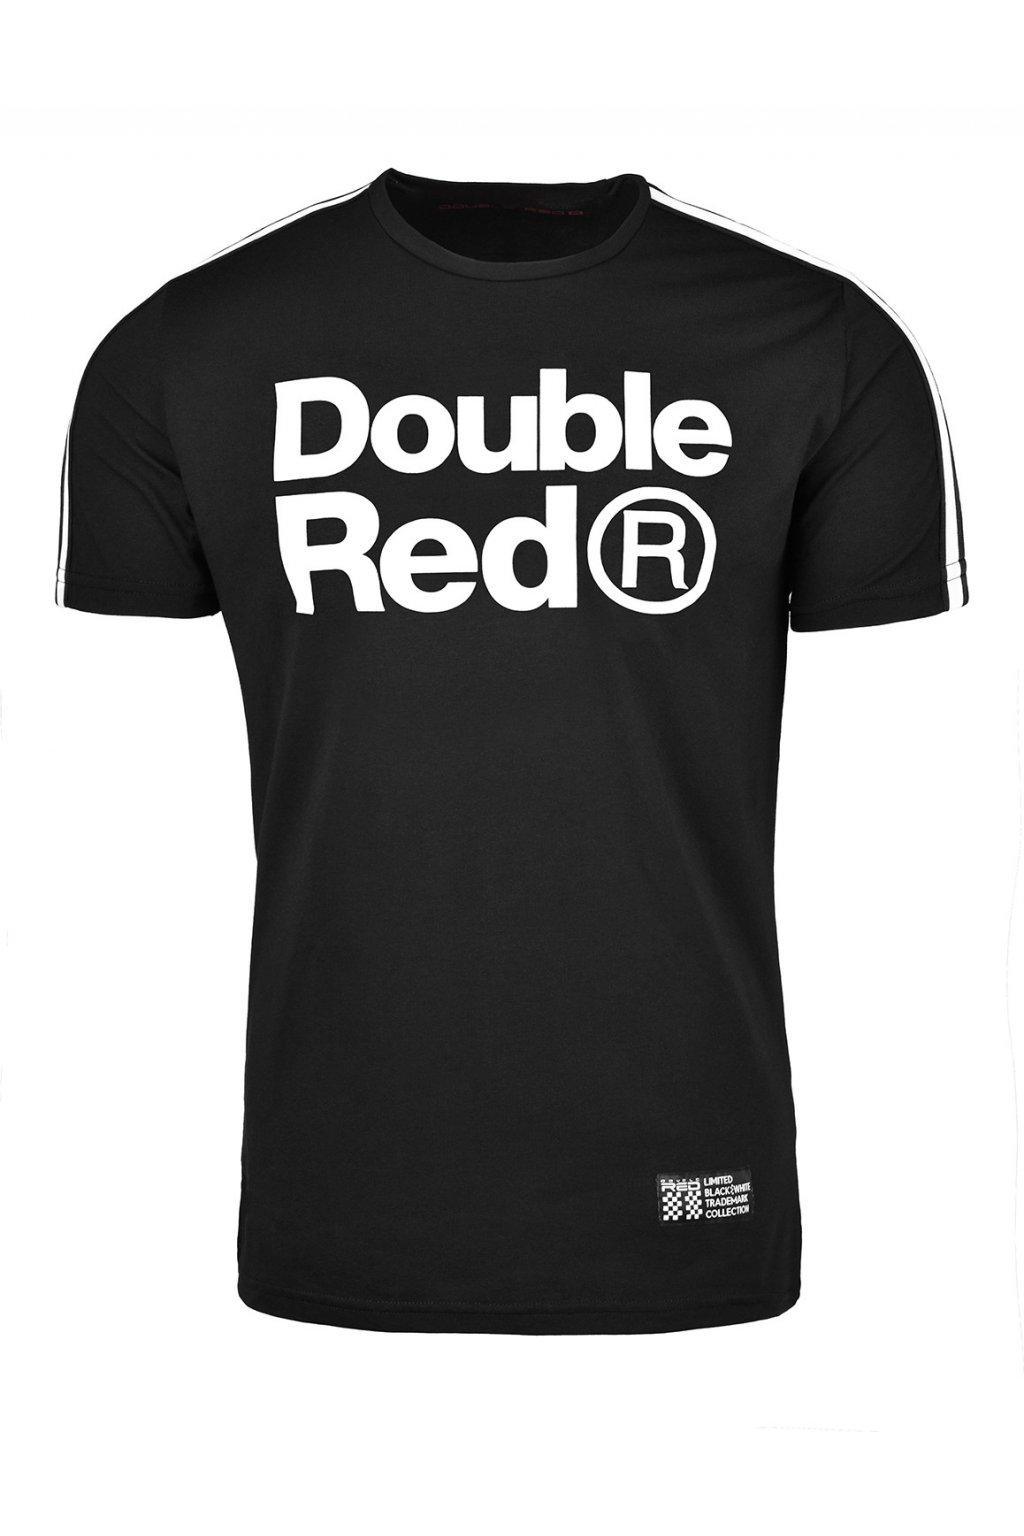 Pánské triko T-Shirt TRADEMARK B&W Edition Black Embroidery Logo obr1